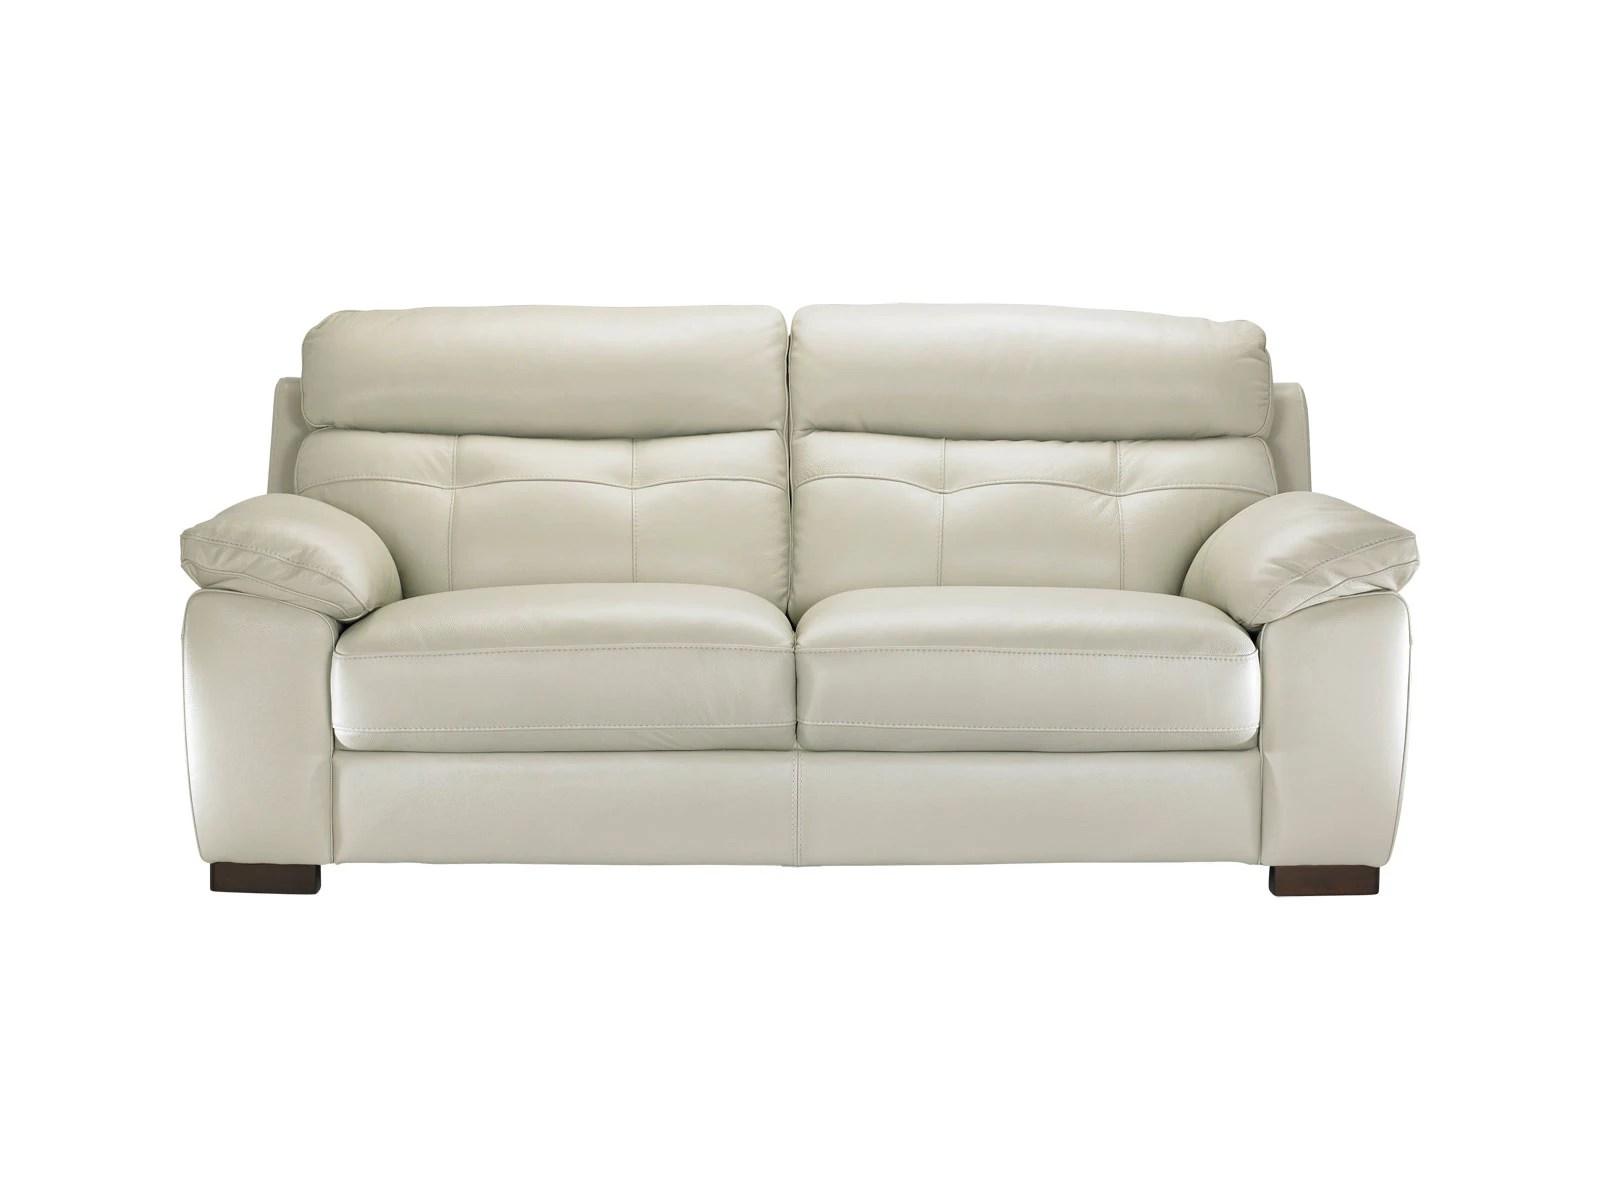 pratts corner sofas light grey tufted sofa search christopher